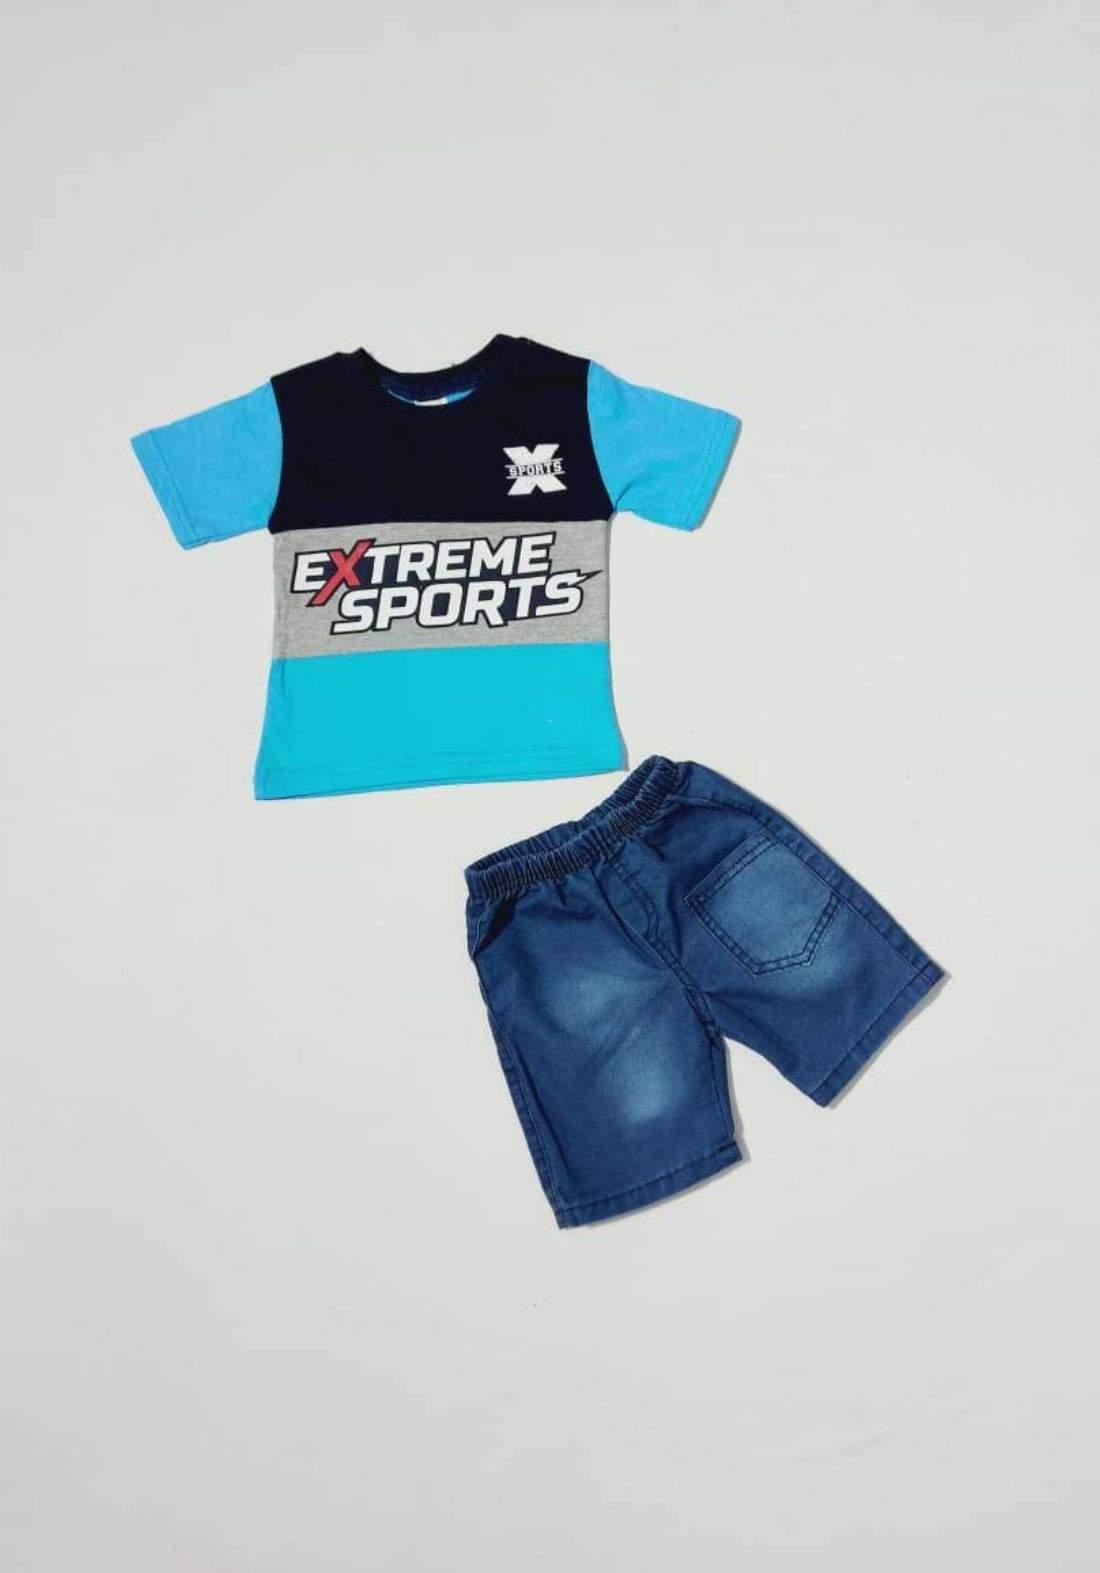 Boys' outfit blue (shirt and short) طقم ولادي سمائي (قميص وشورت )